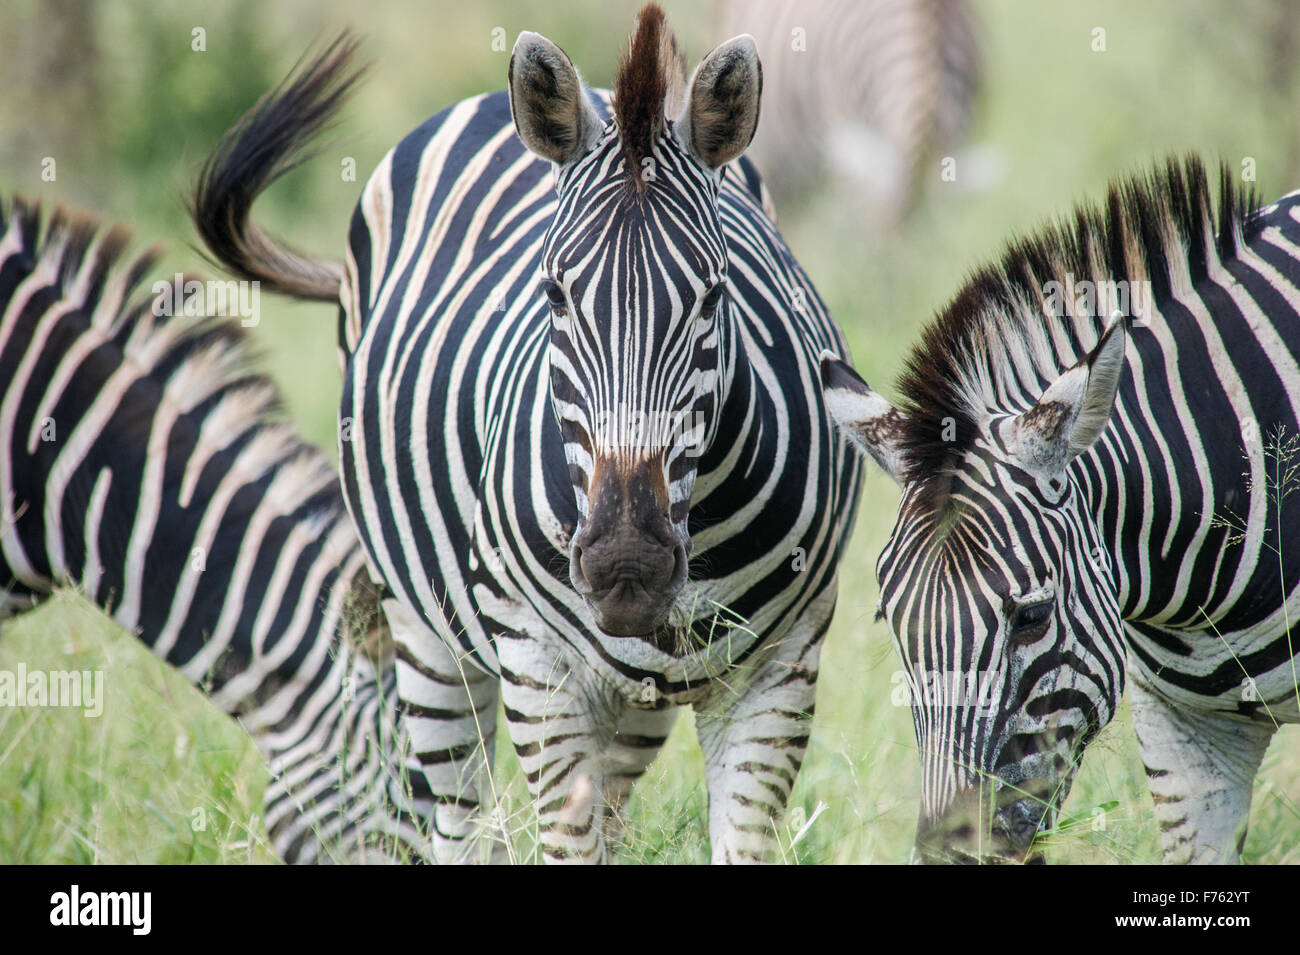 SOUTH AFRICA- Kruger National Park  Zebra (Equus burchelli) - Stock Image